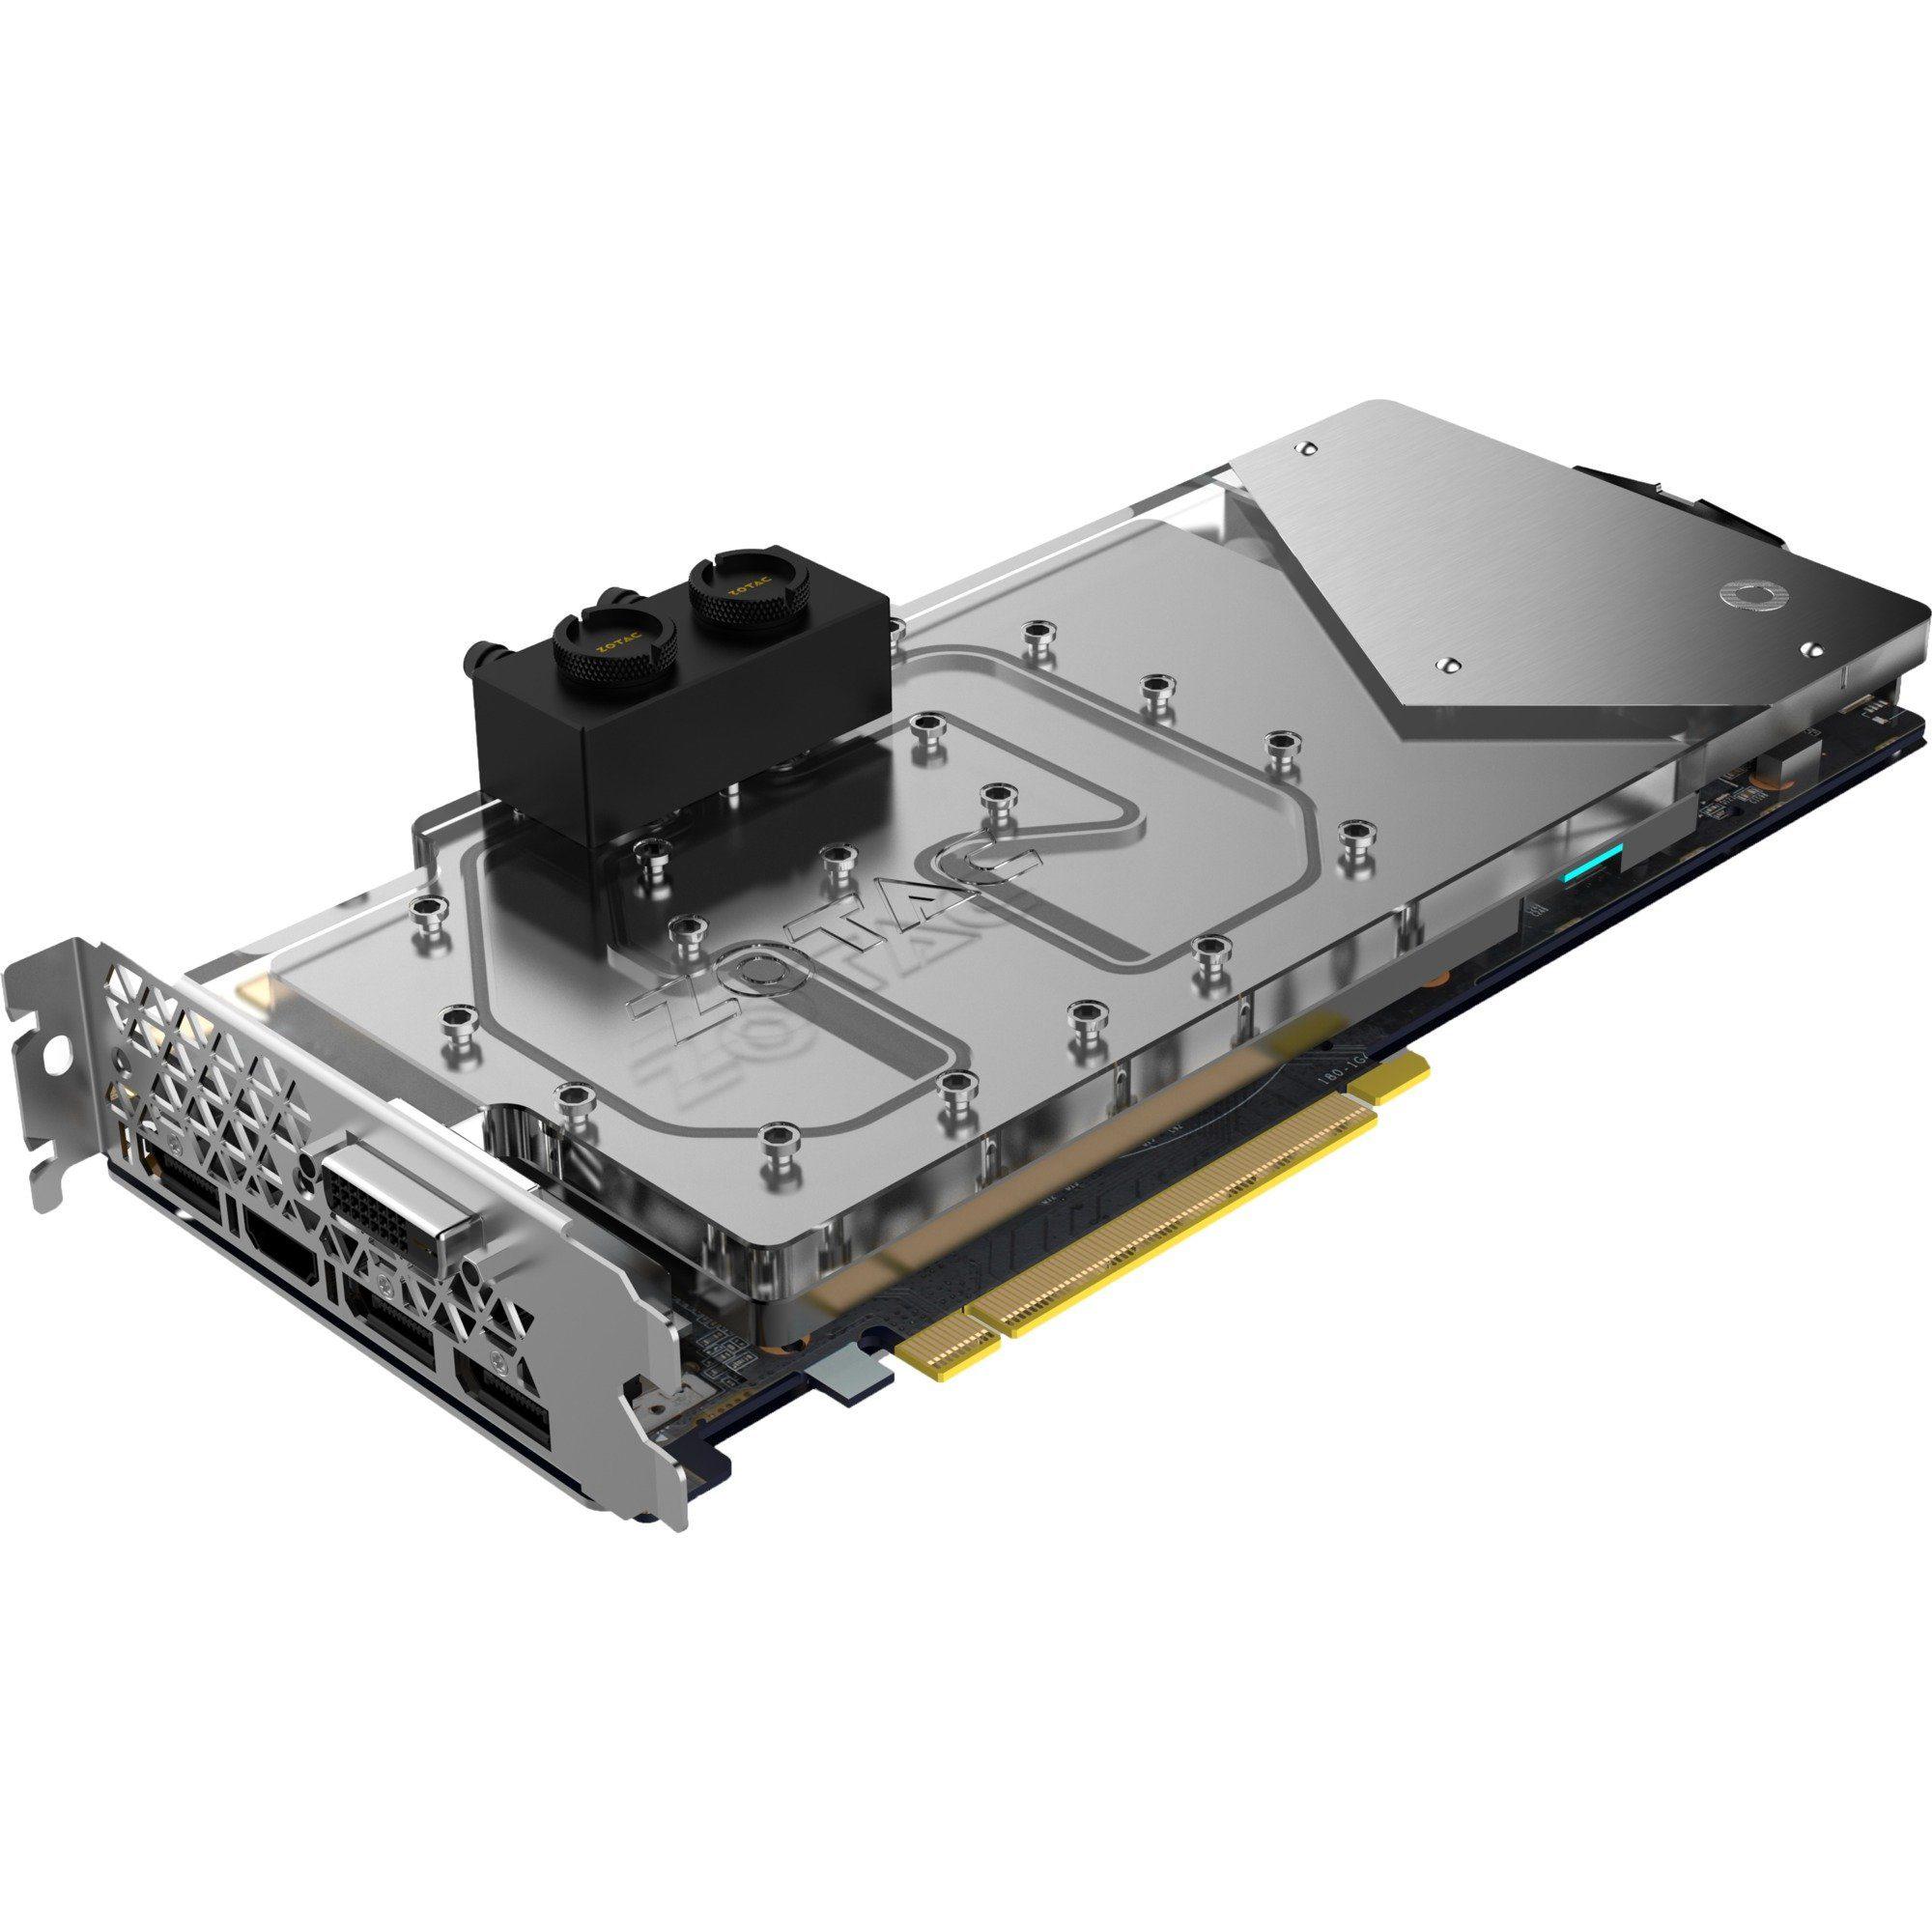 ZOTAC Grafikkarte »GeForce GTX 1080 ArcticStorm«